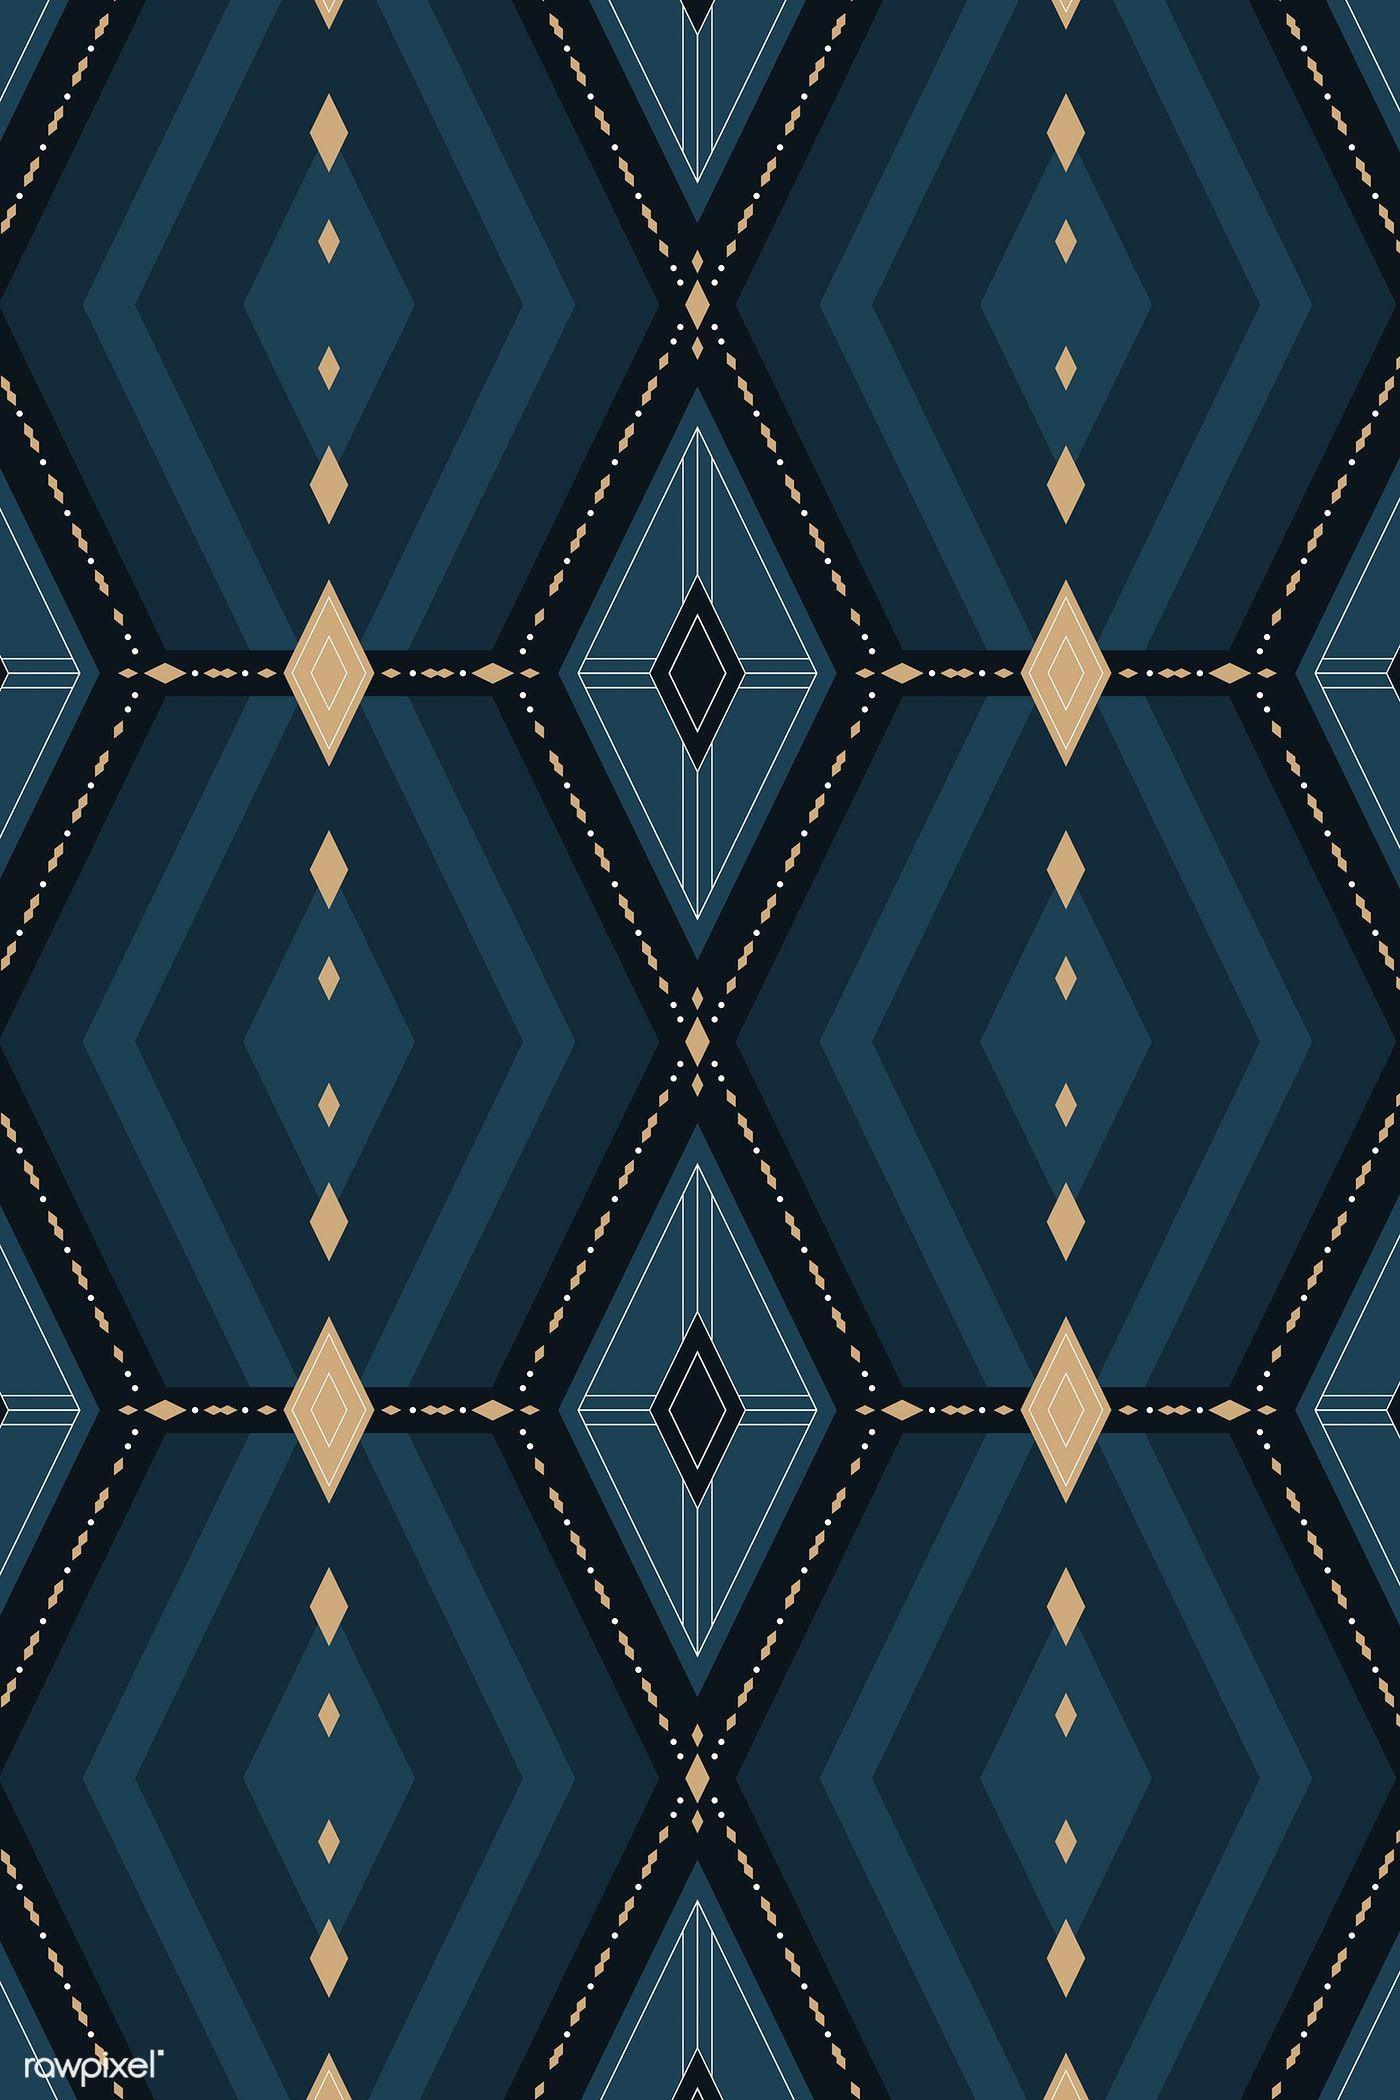 Download premium vector of Seamless navy blue geometric